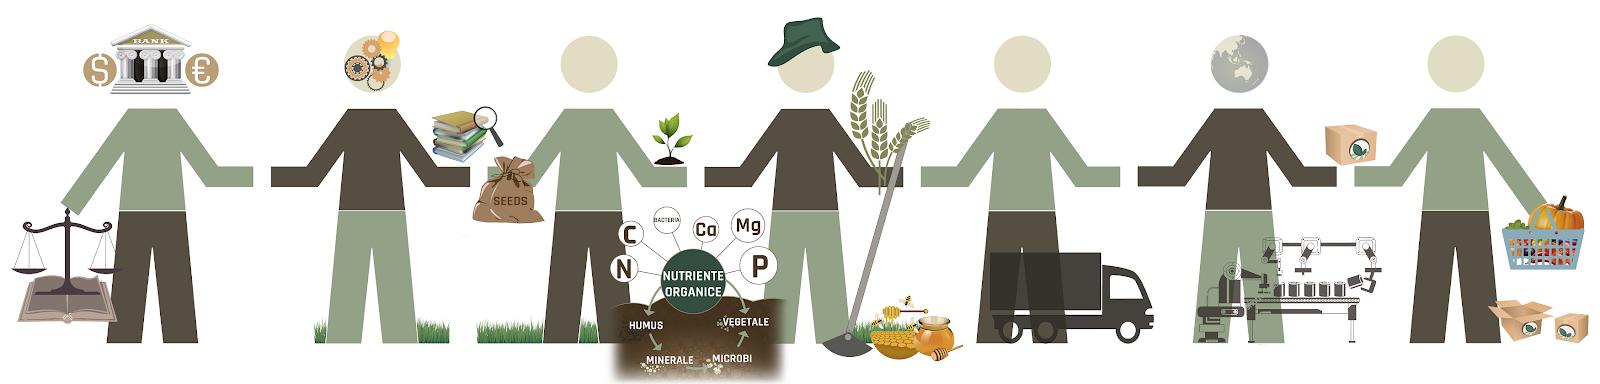 Moldova Organic Value Chain Alliance